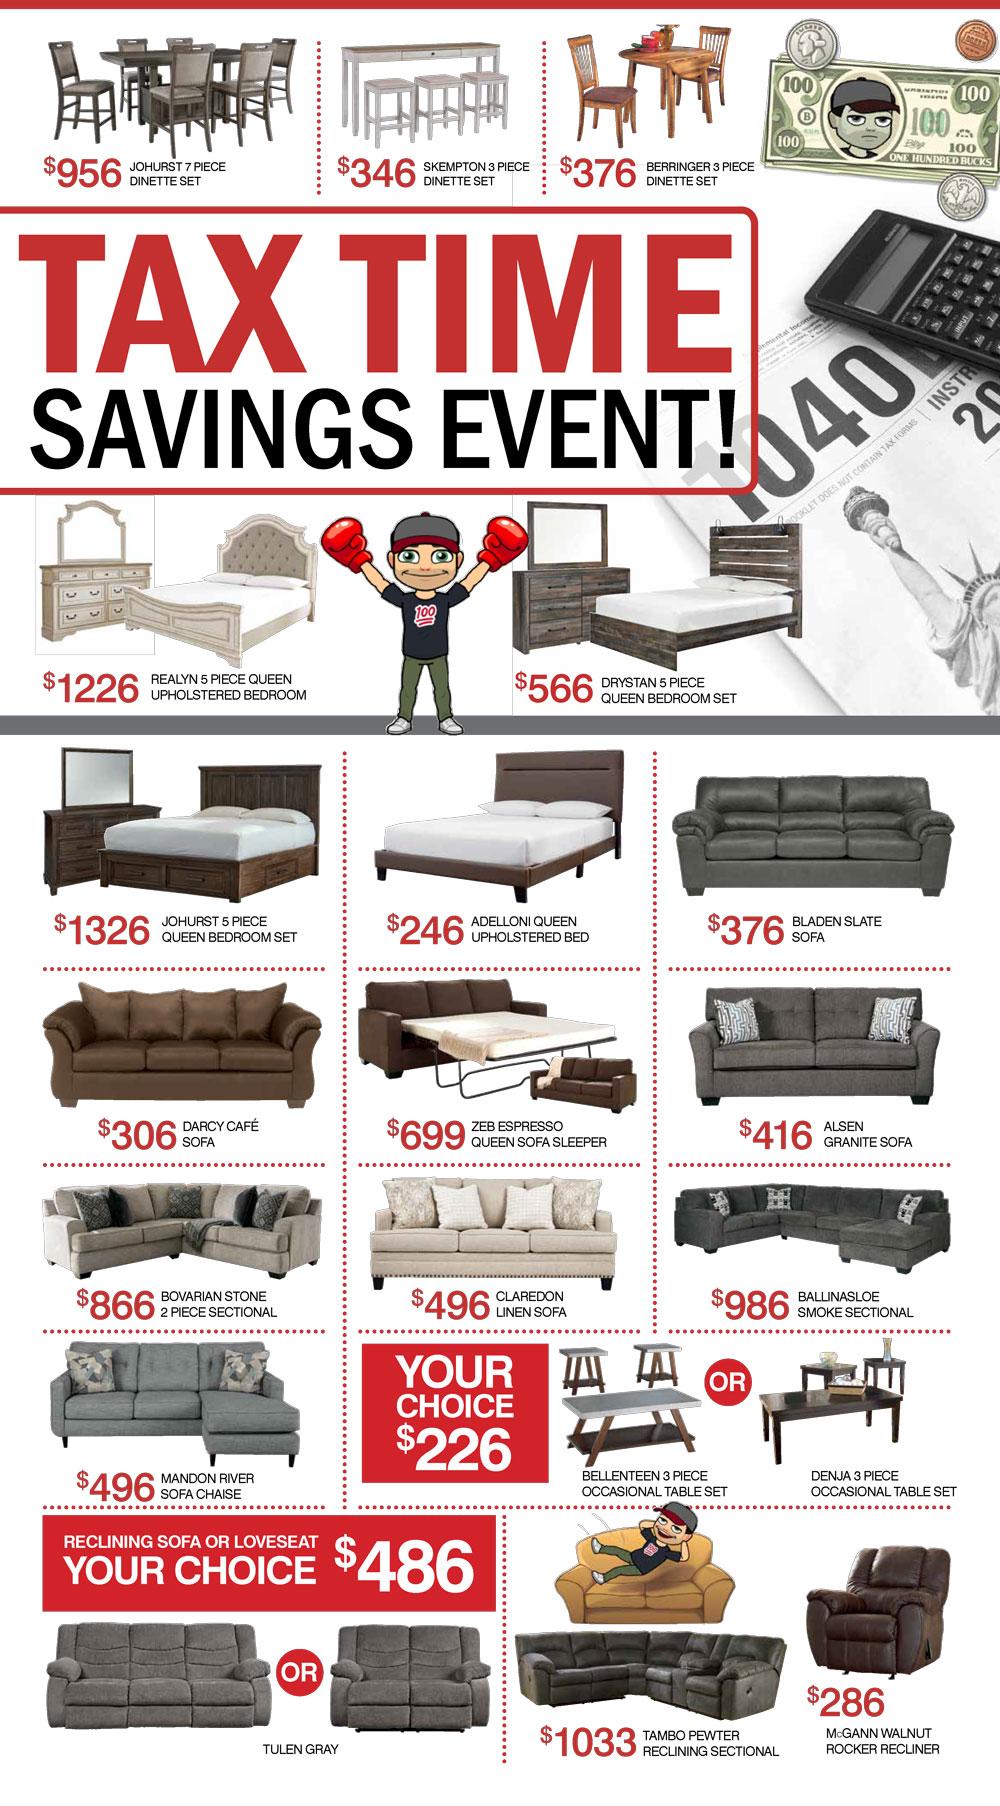 jakes-tax-time-savings-event-ad-1.jpg